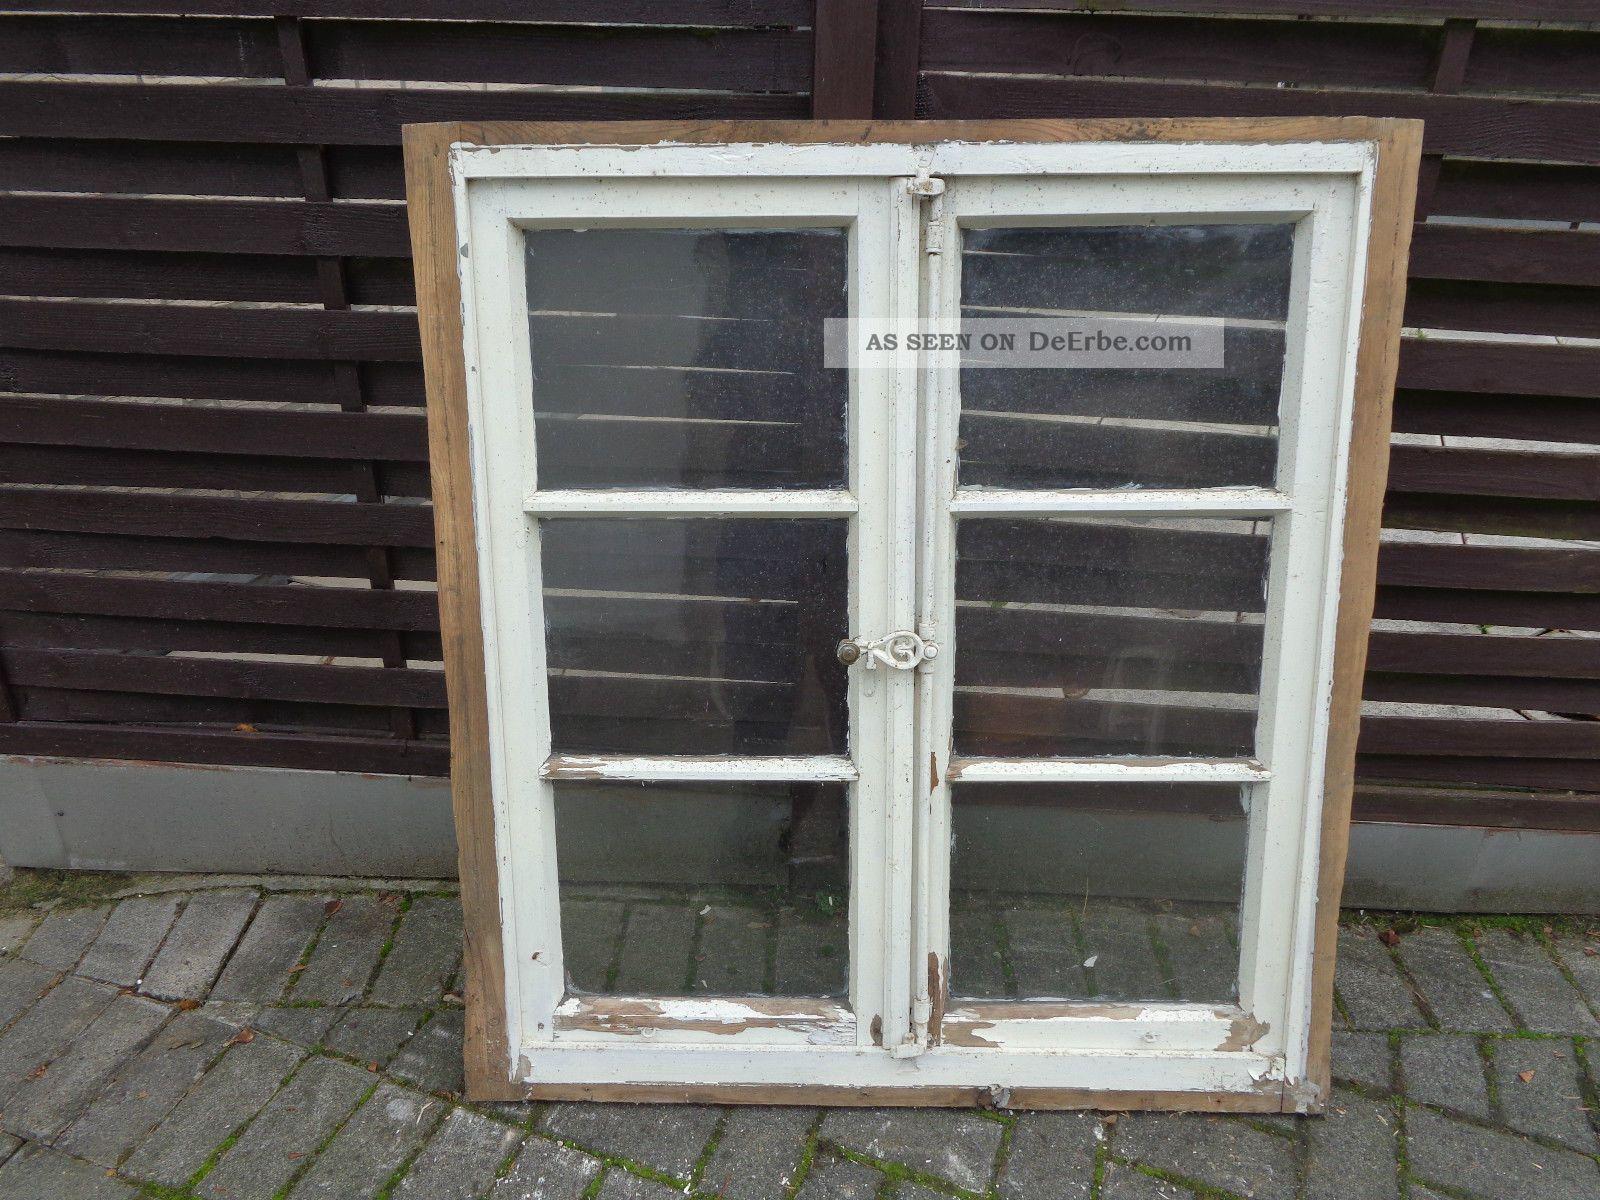 historisches sprossenfenster aus holz m rahmen vintage shabby chic unrest 4. Black Bedroom Furniture Sets. Home Design Ideas